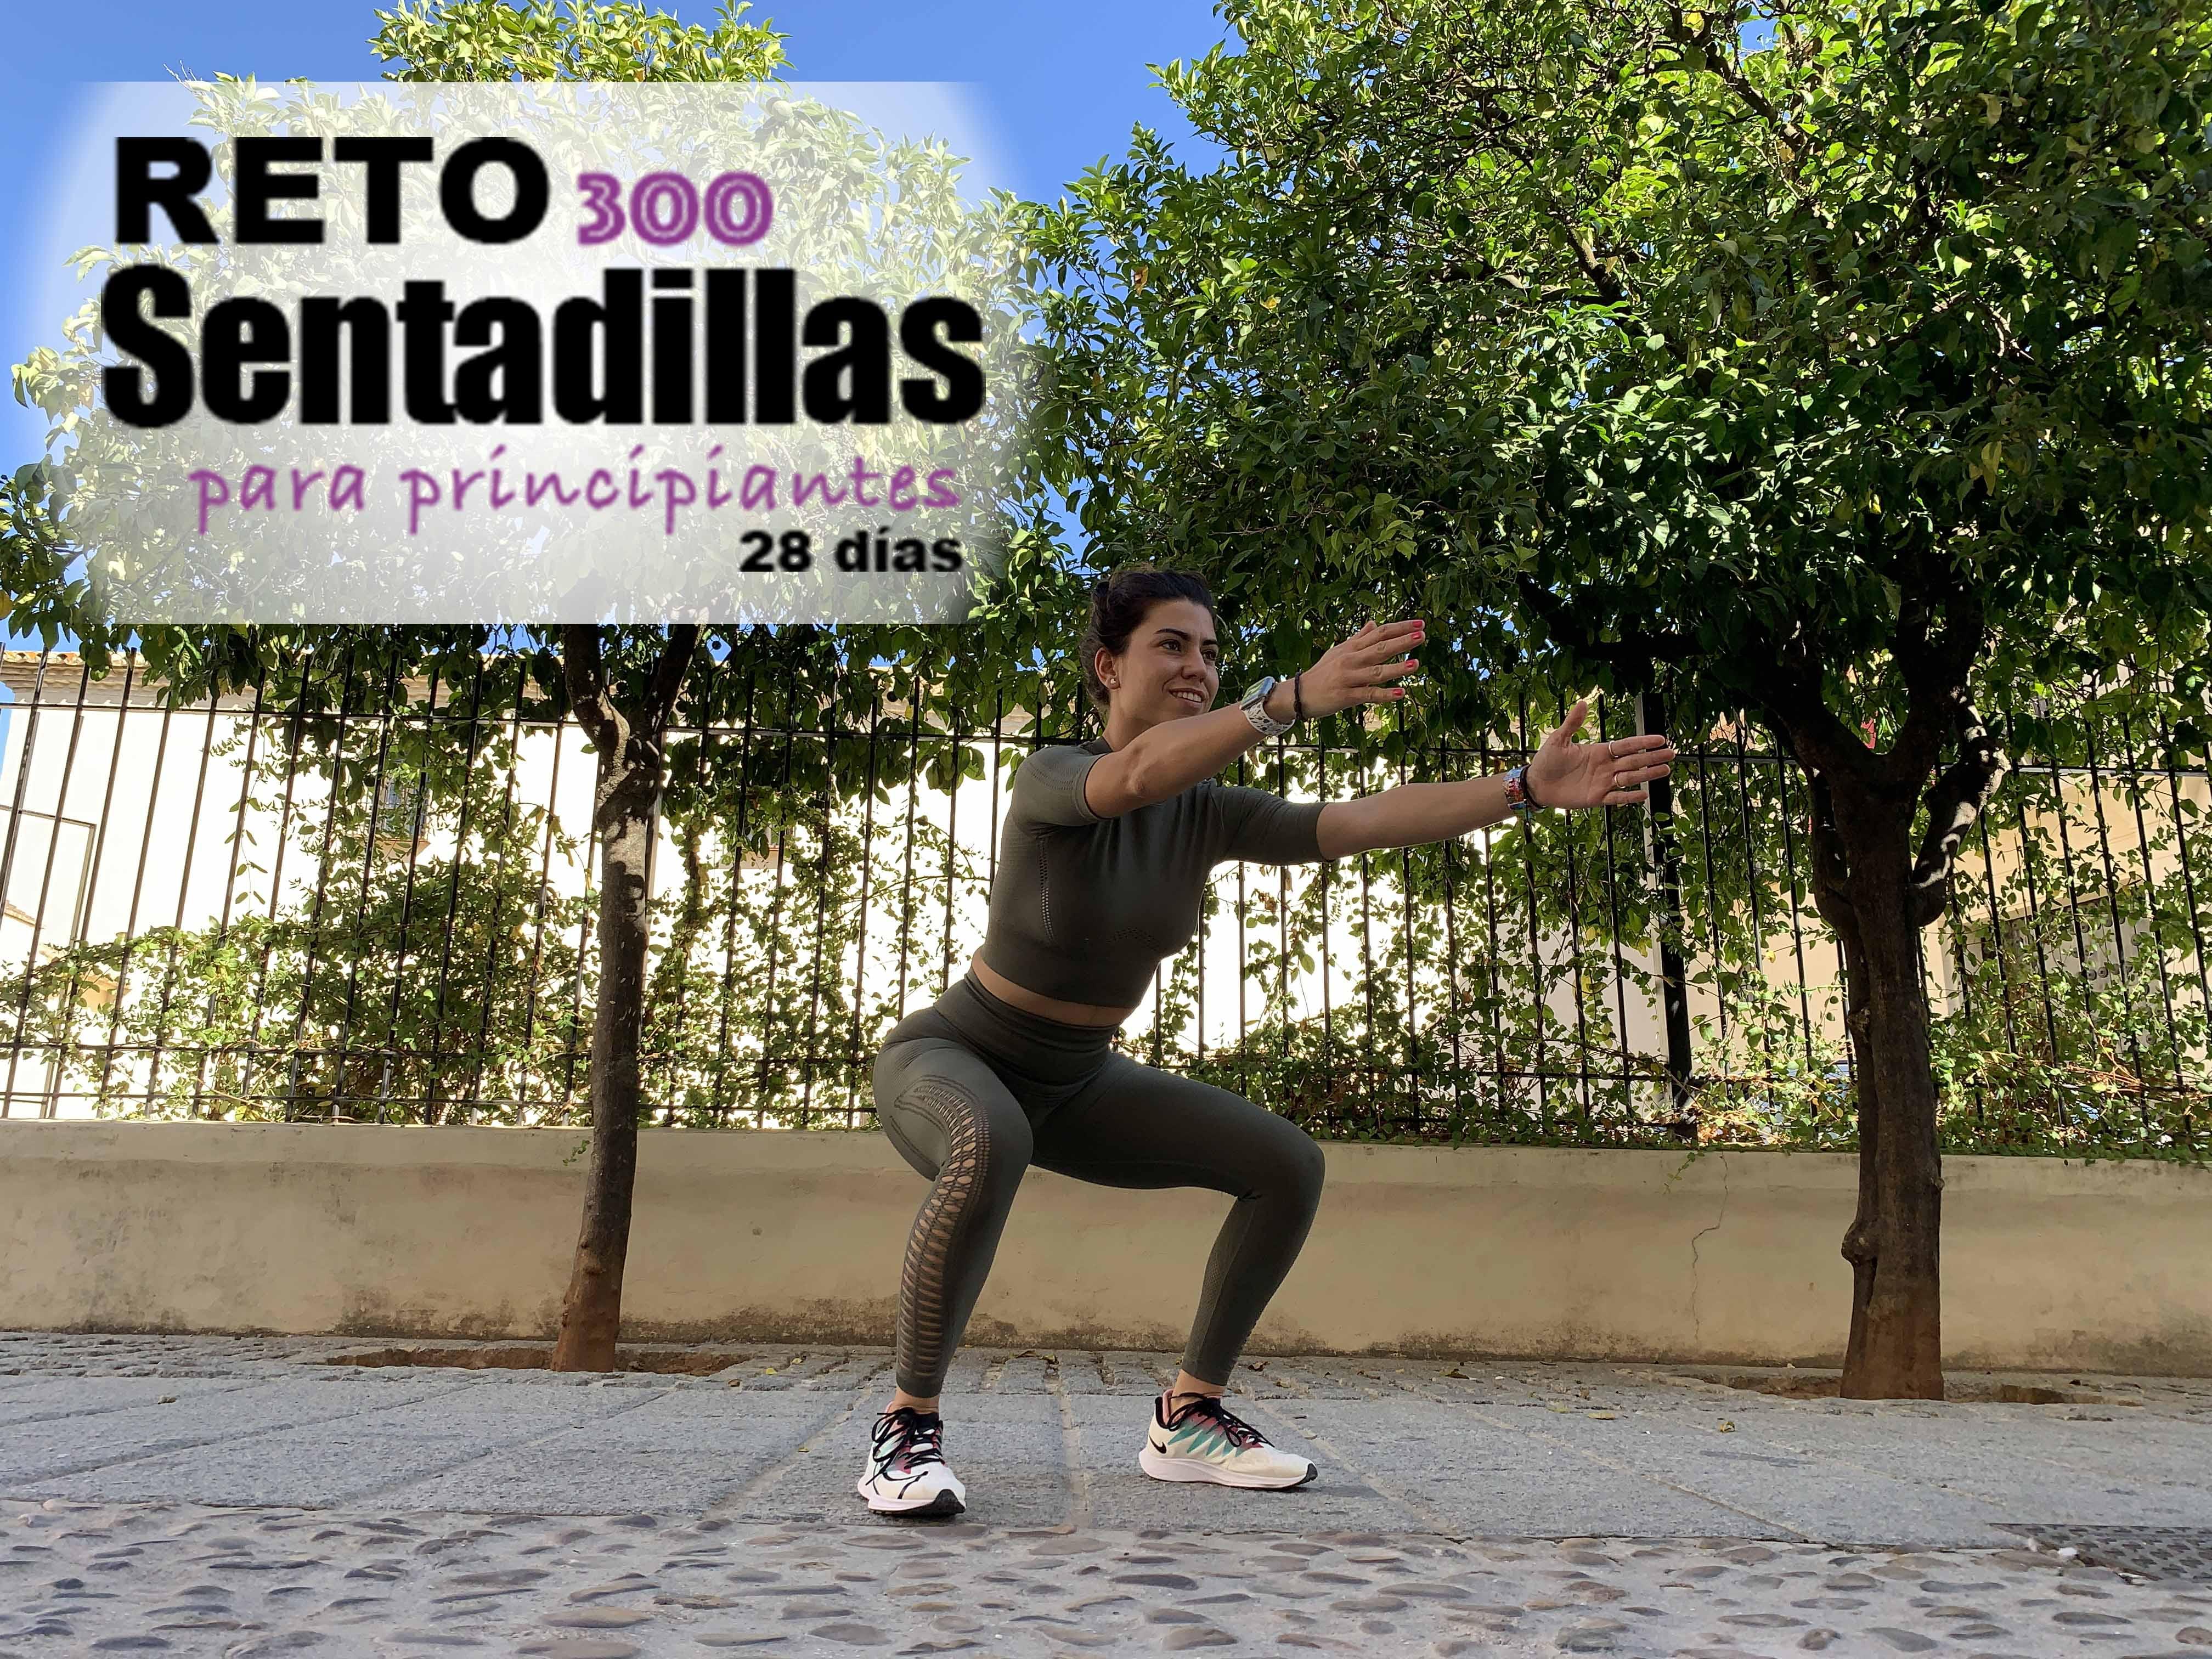 Reto mTraining – 300 sentadillas (principiantes)